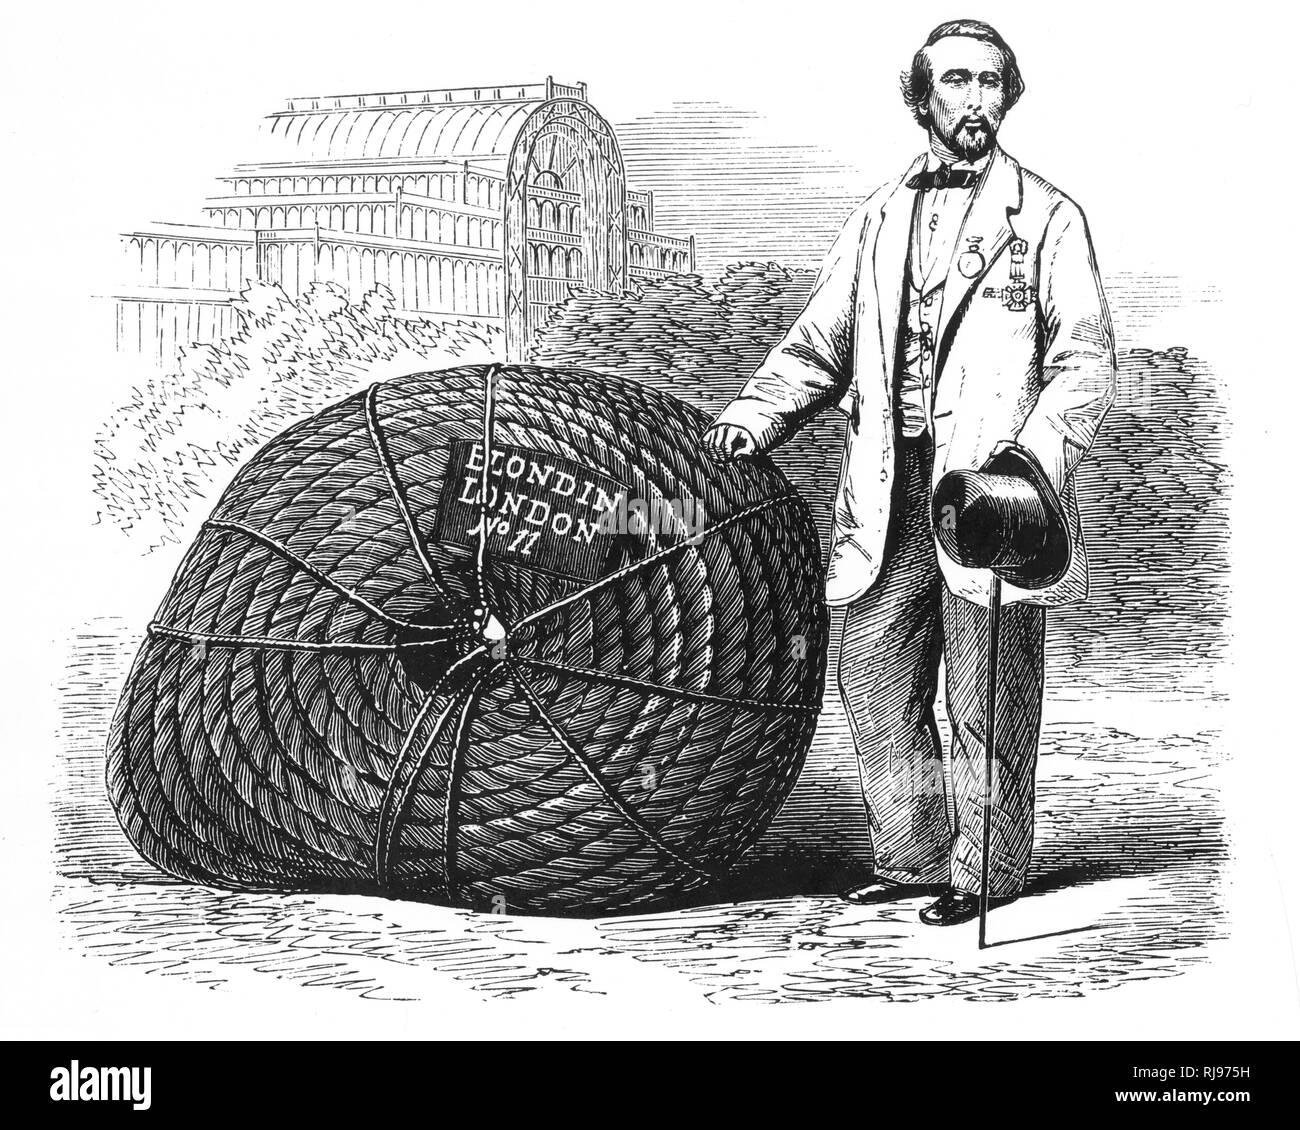 'Blondin' (JEAN-FRANCOIS GRAVELET) - with his tightrope in London Stock Photo